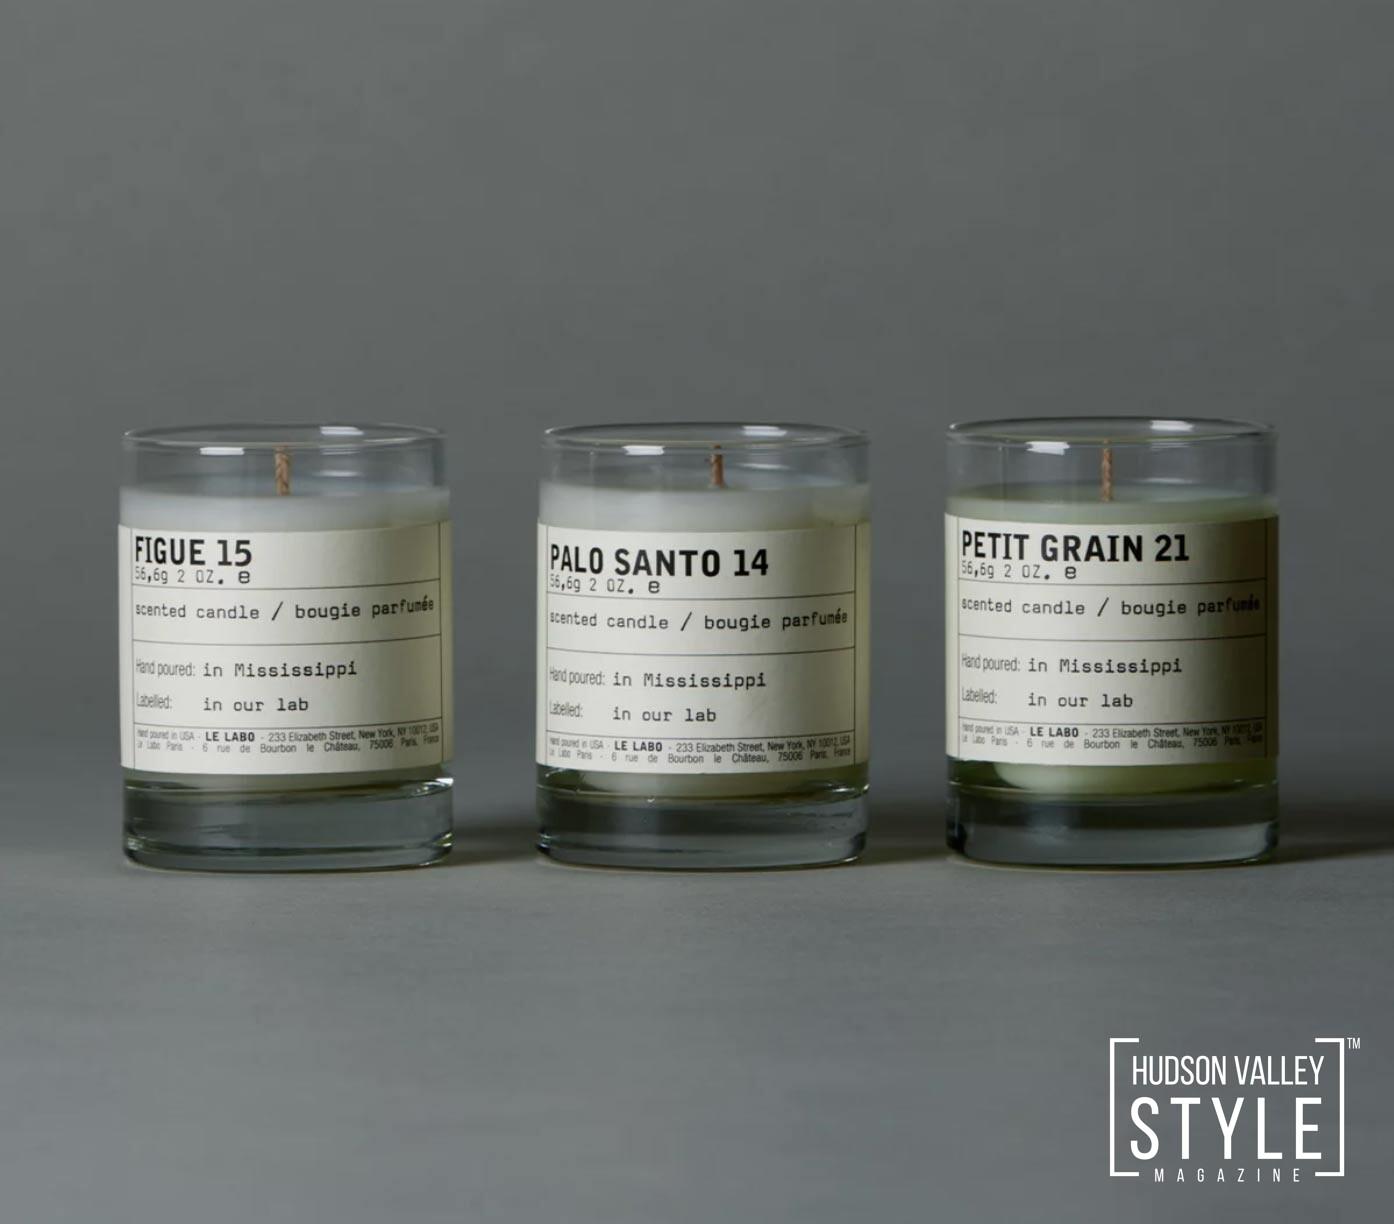 Holiday Gift Ideas 2020: Le Labo Fragrances Discovery Set